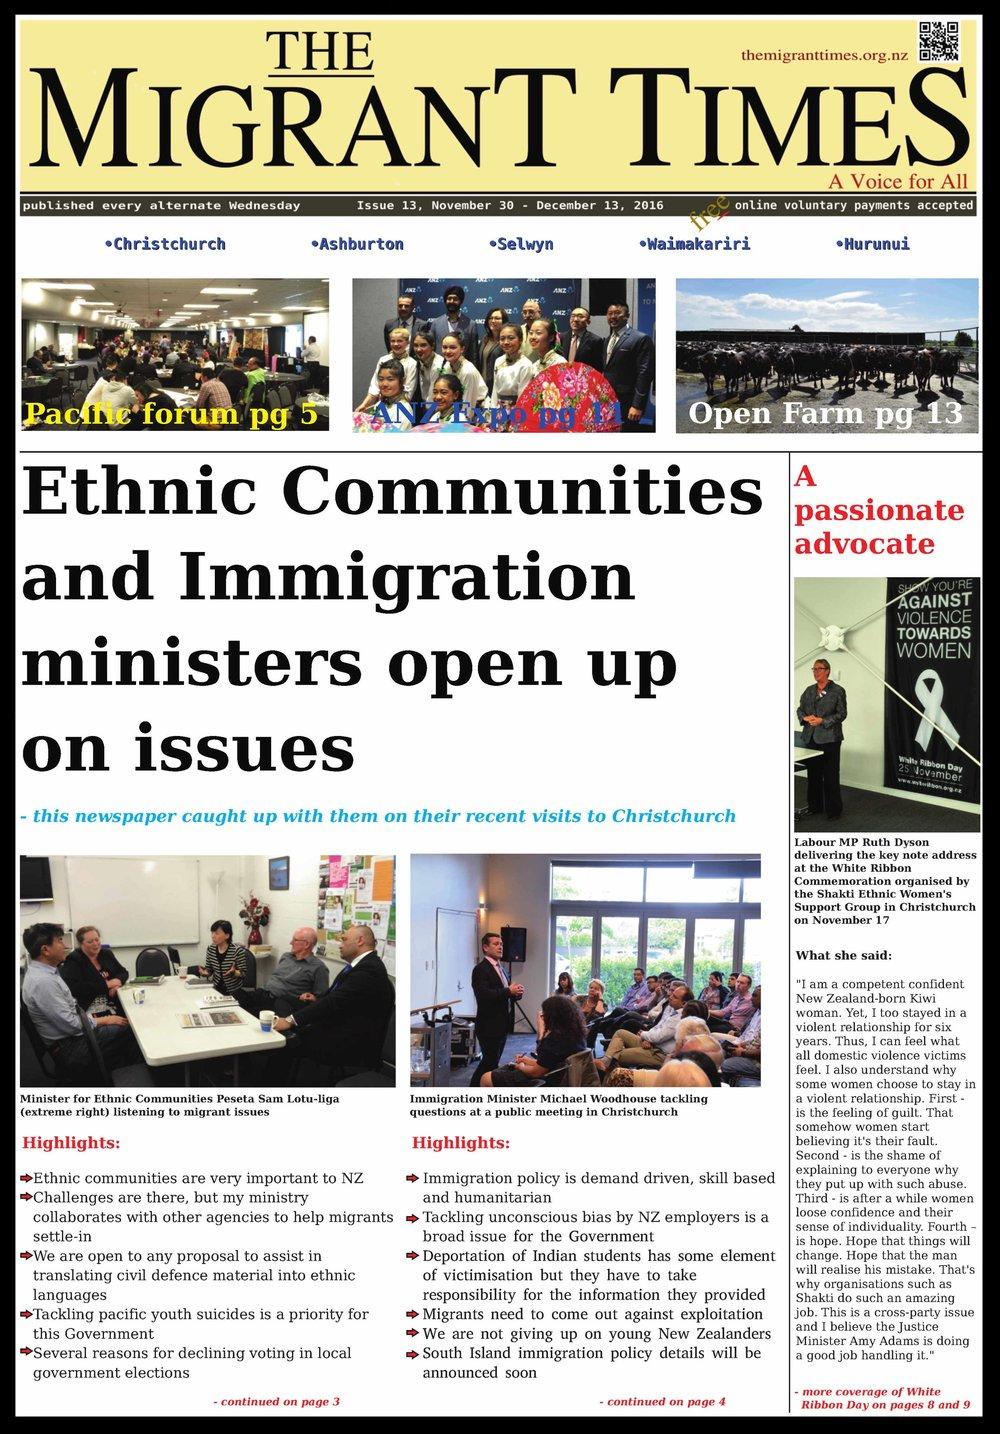 Issue 13, November 30 - December 13, 2016